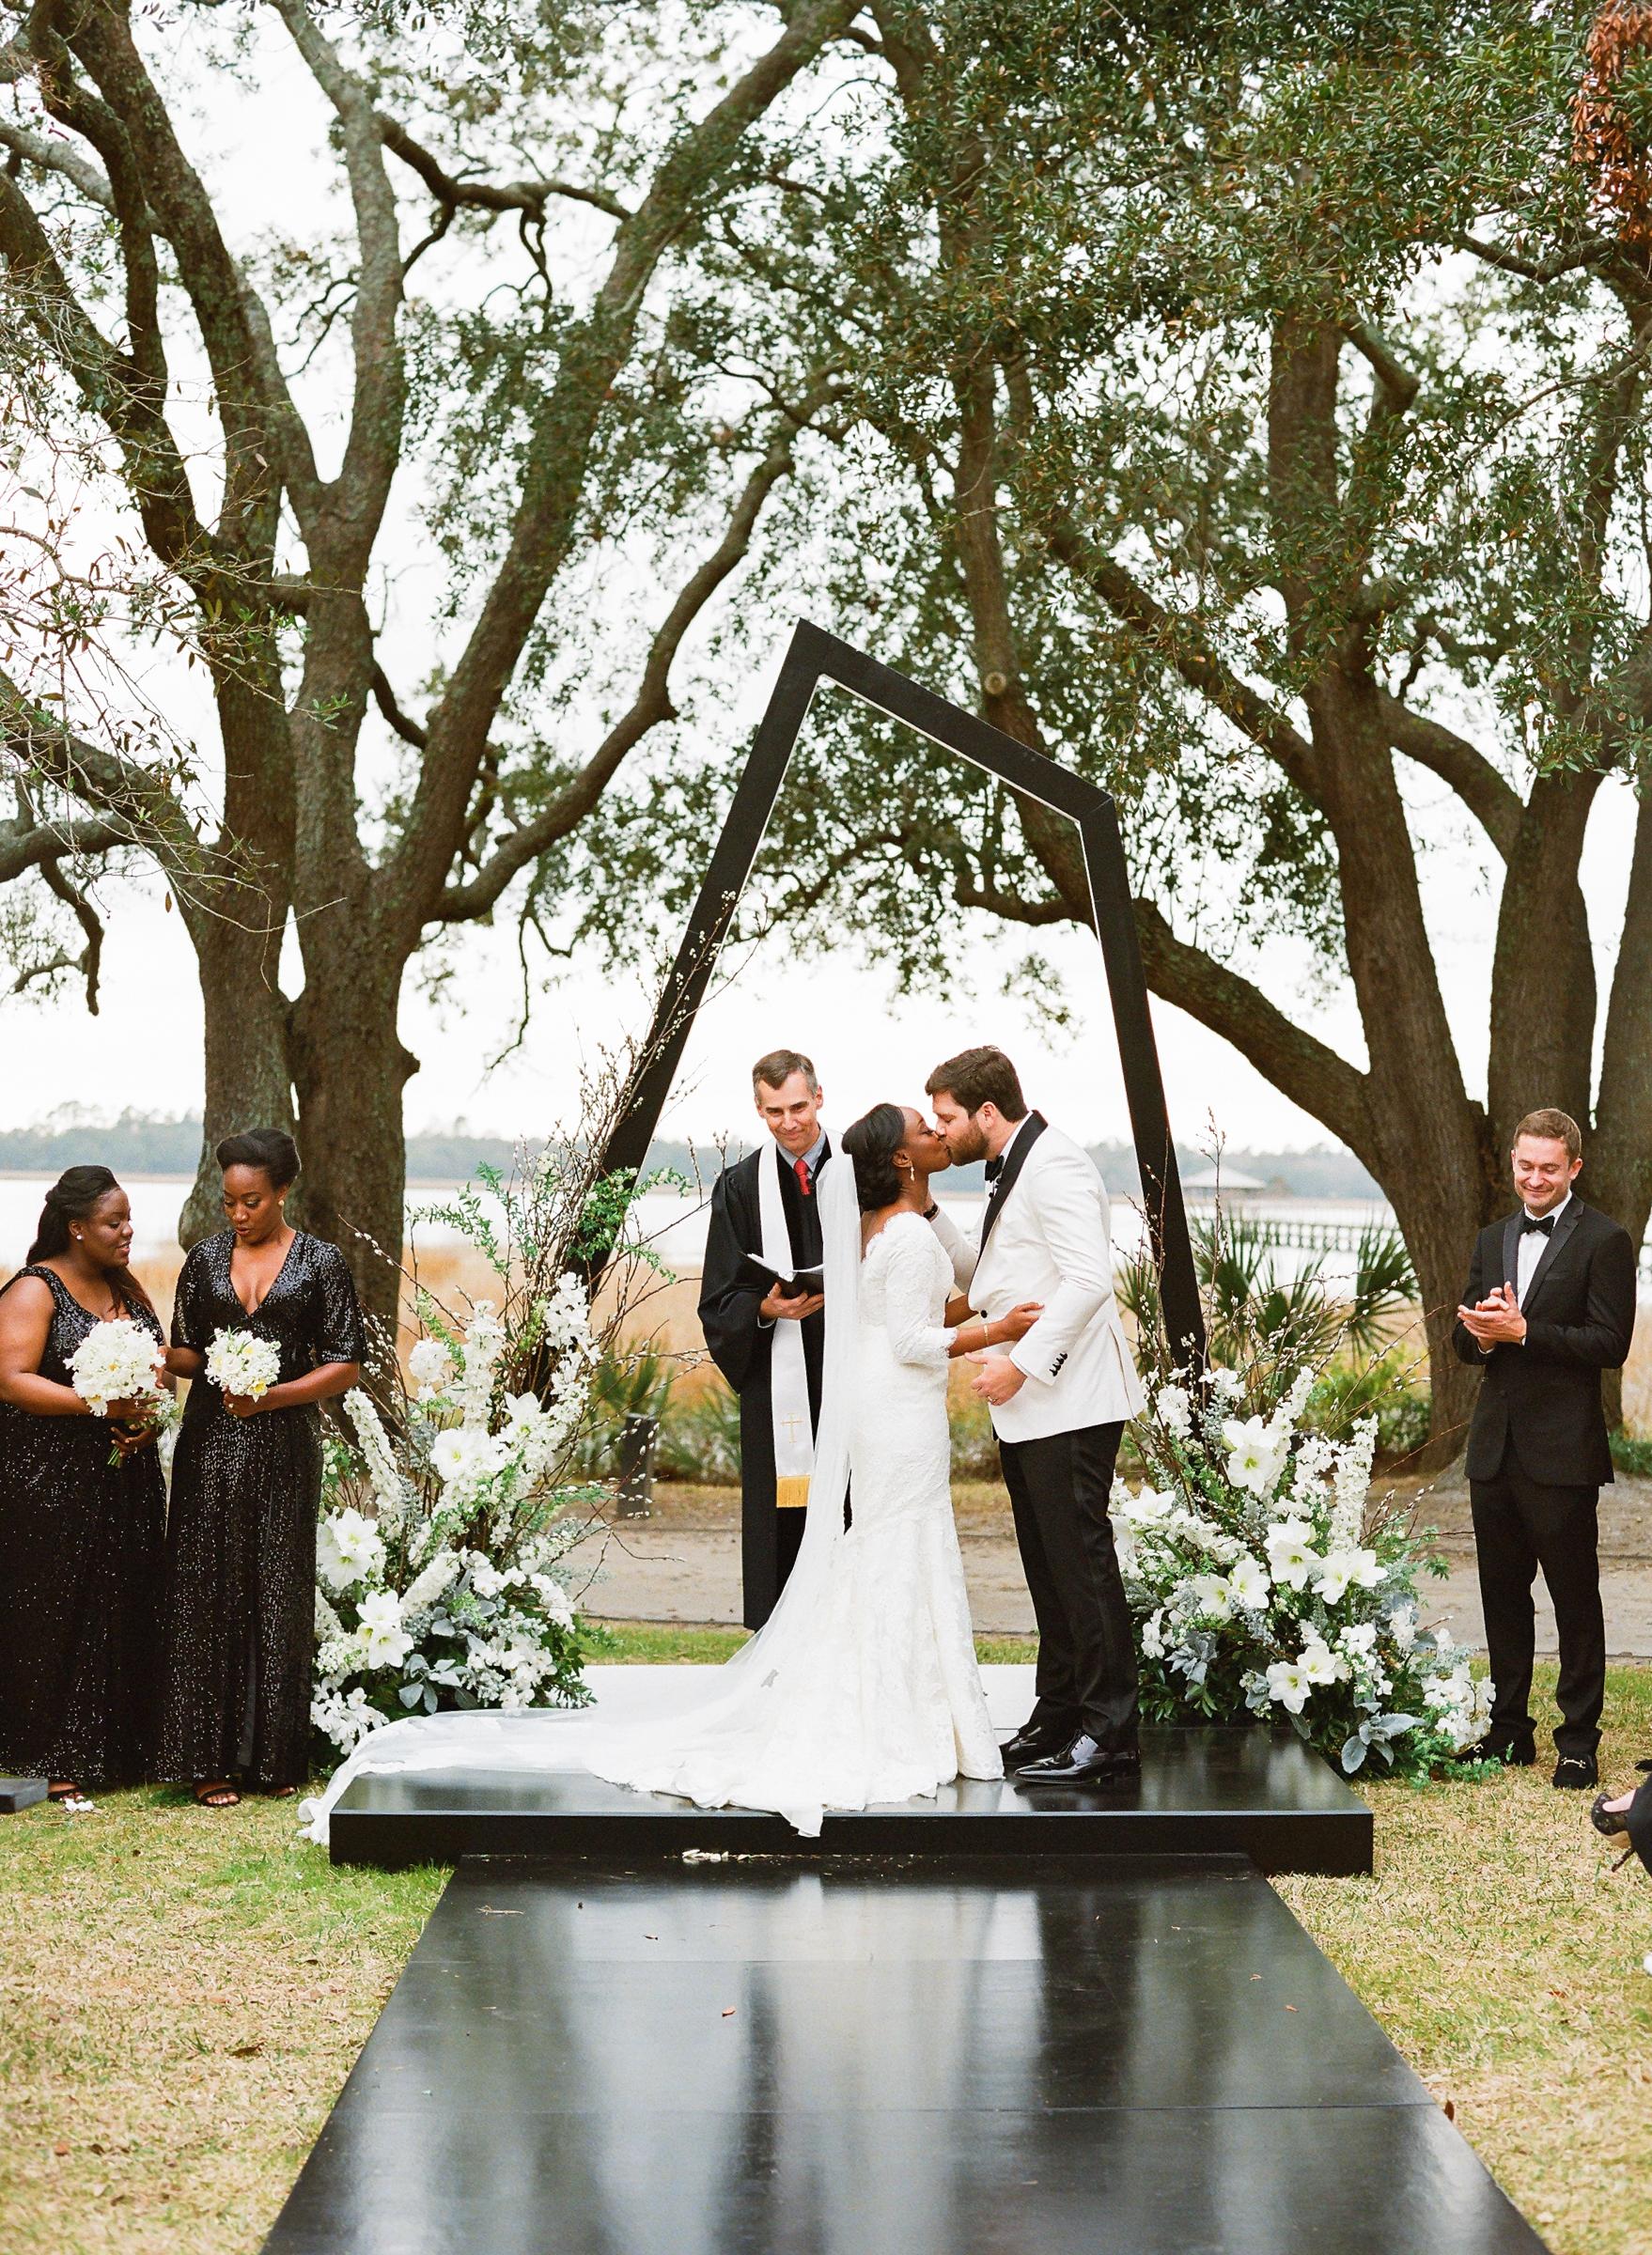 hamida charlie charleson wedding ceremony